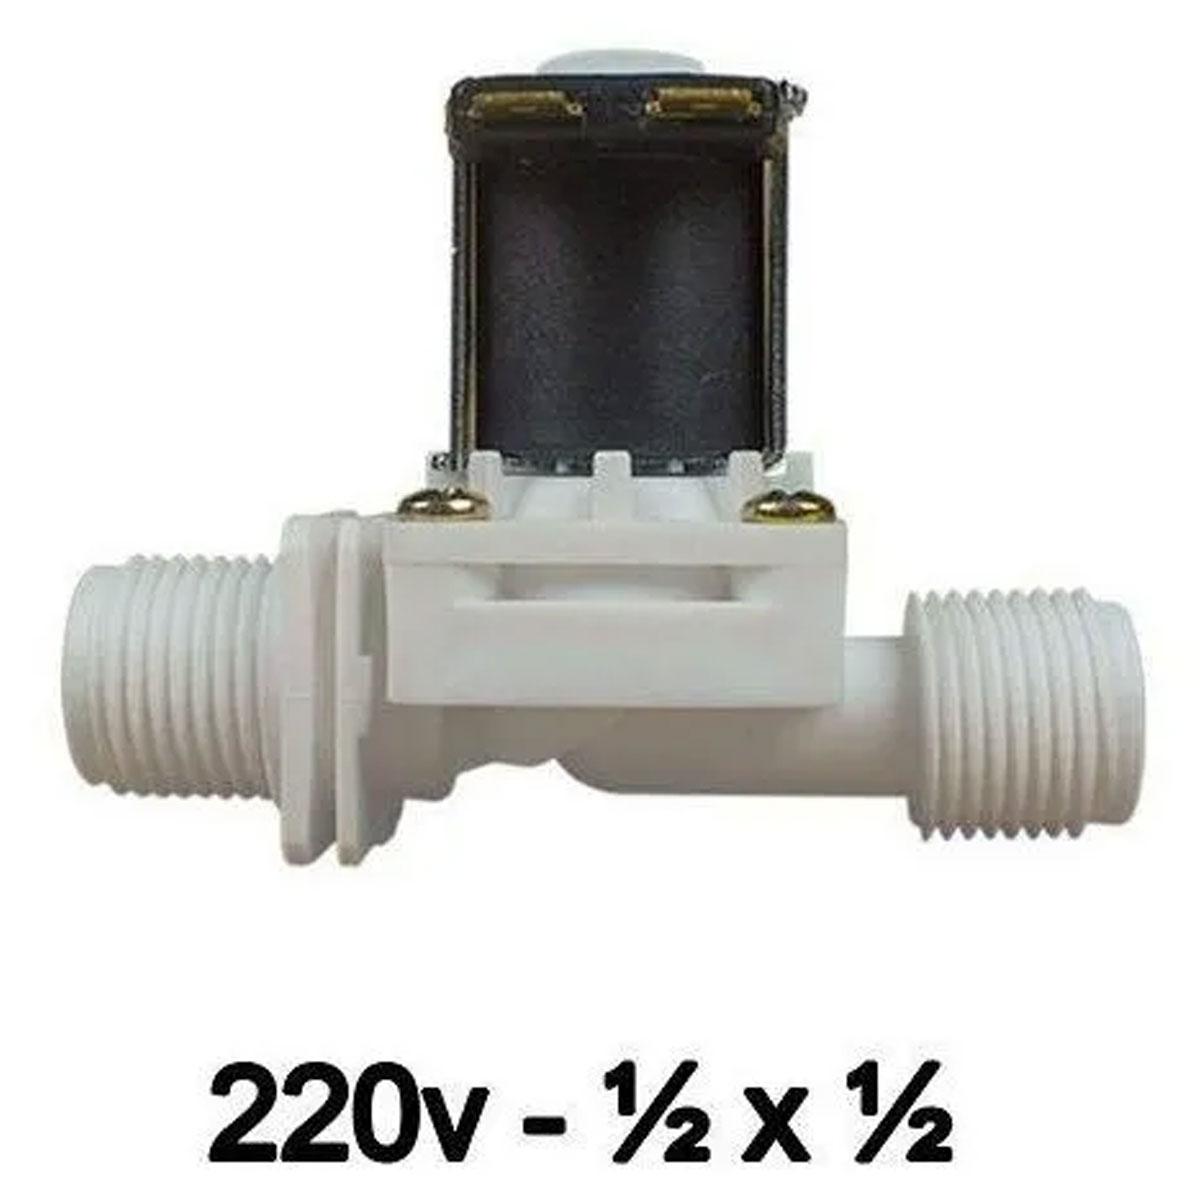 Válvula Solenoide 220v AC 180° (1/2 X 1/2) VA 03